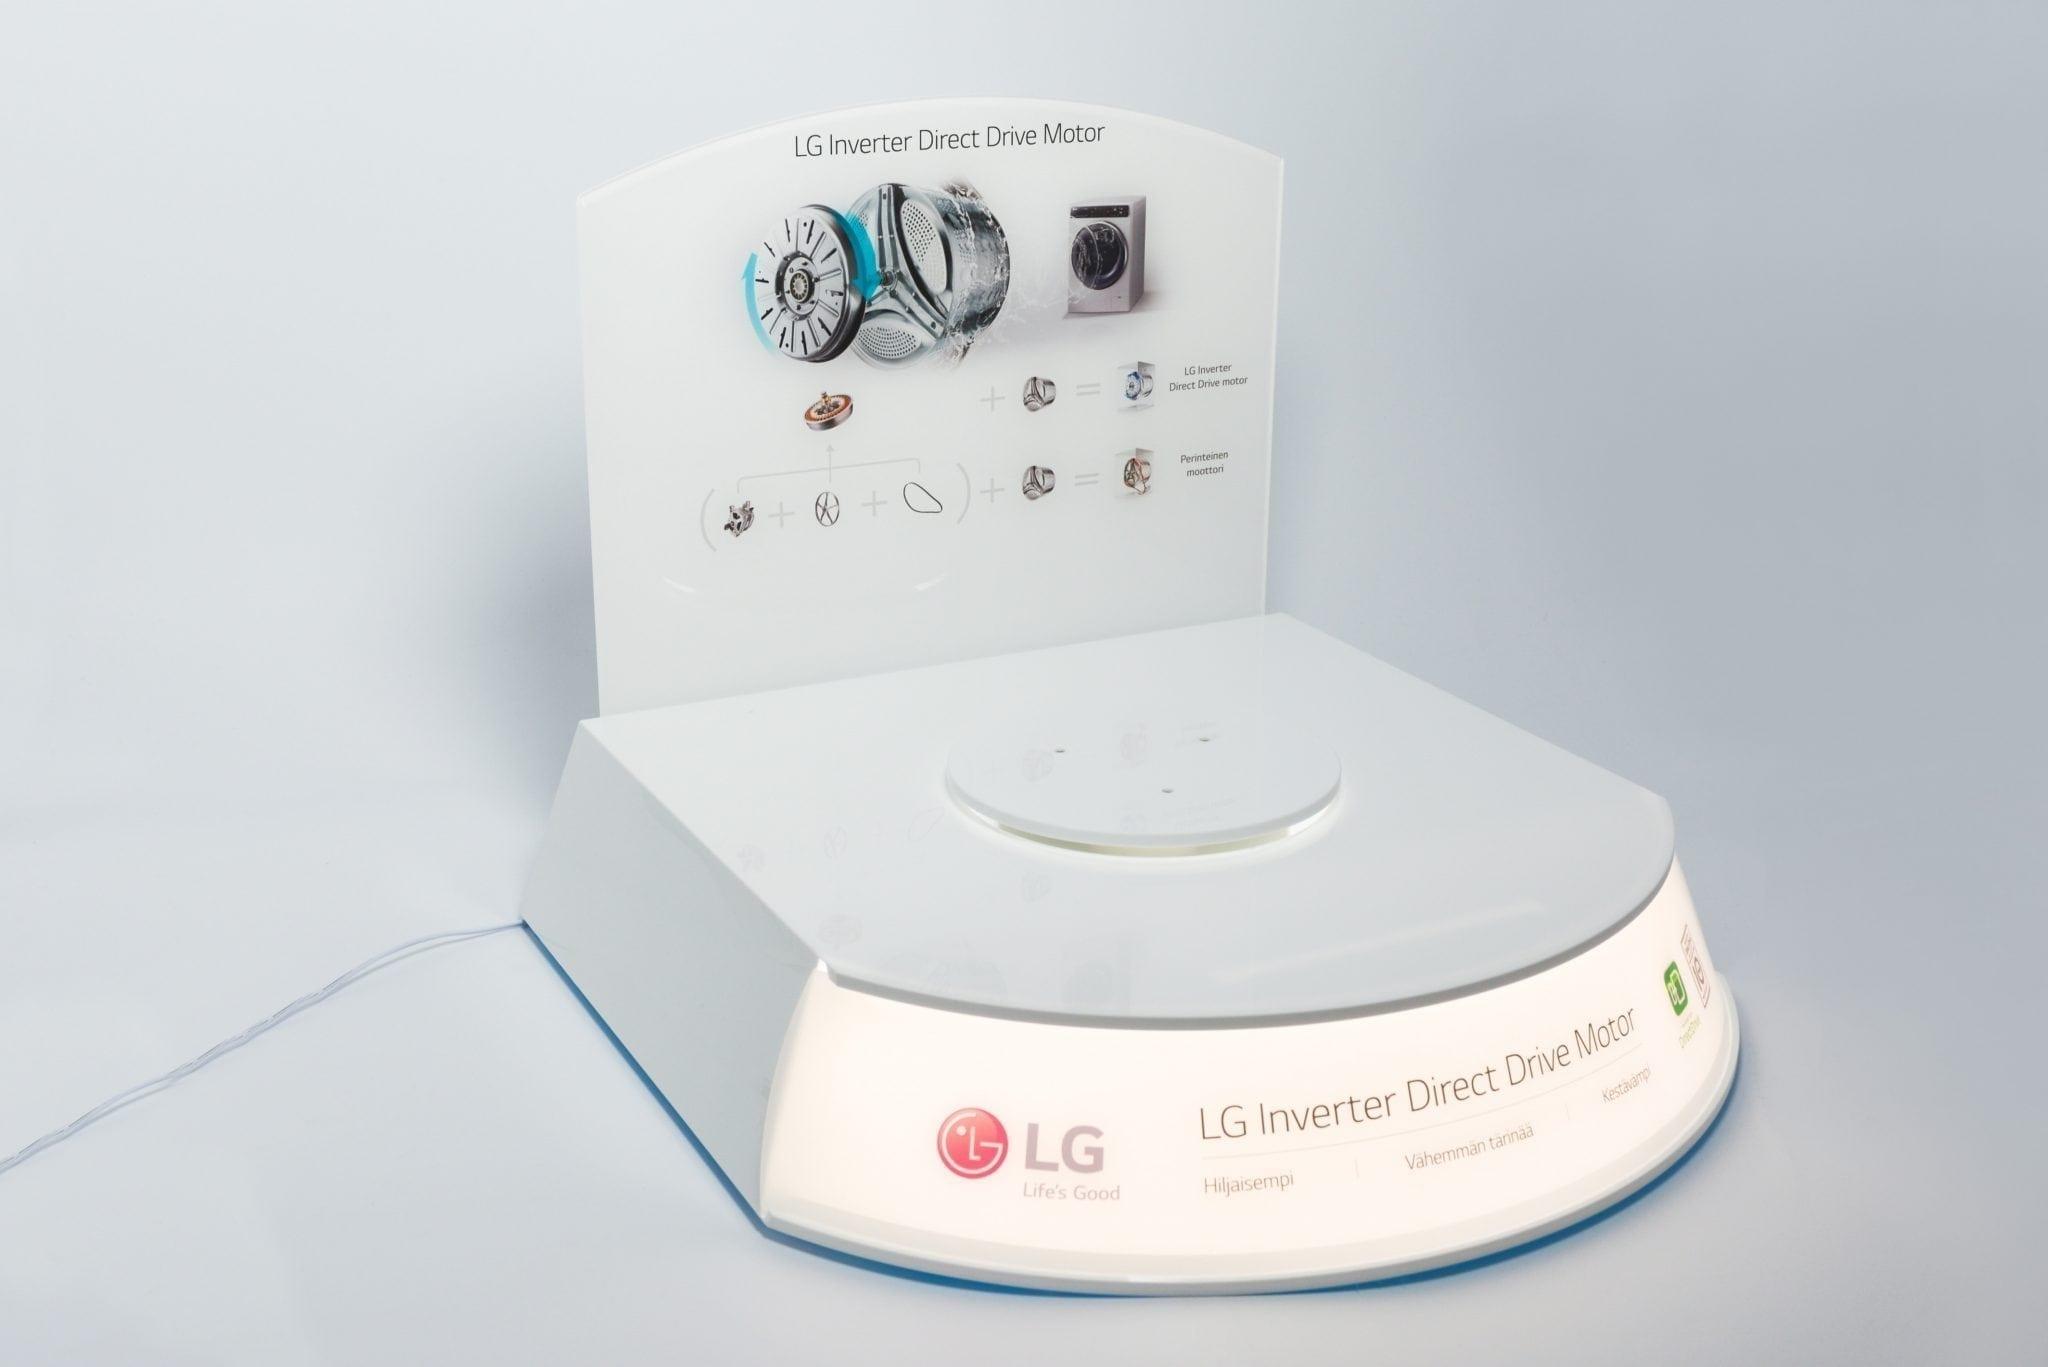 LG product display